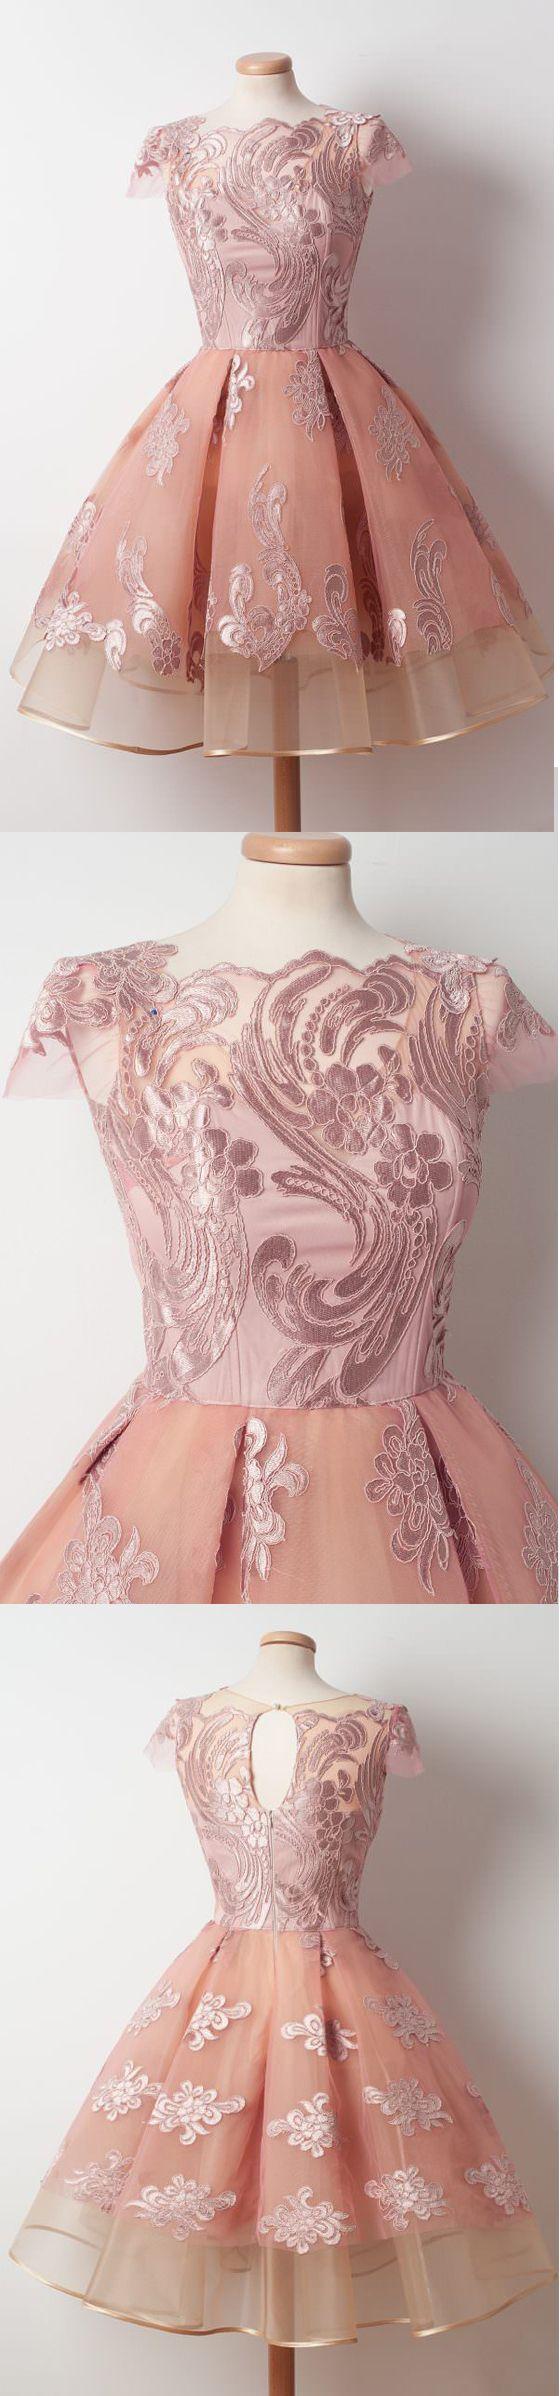 Cap Sleeves Junior Pretty Applique Short Homecoming Dresses, WG805